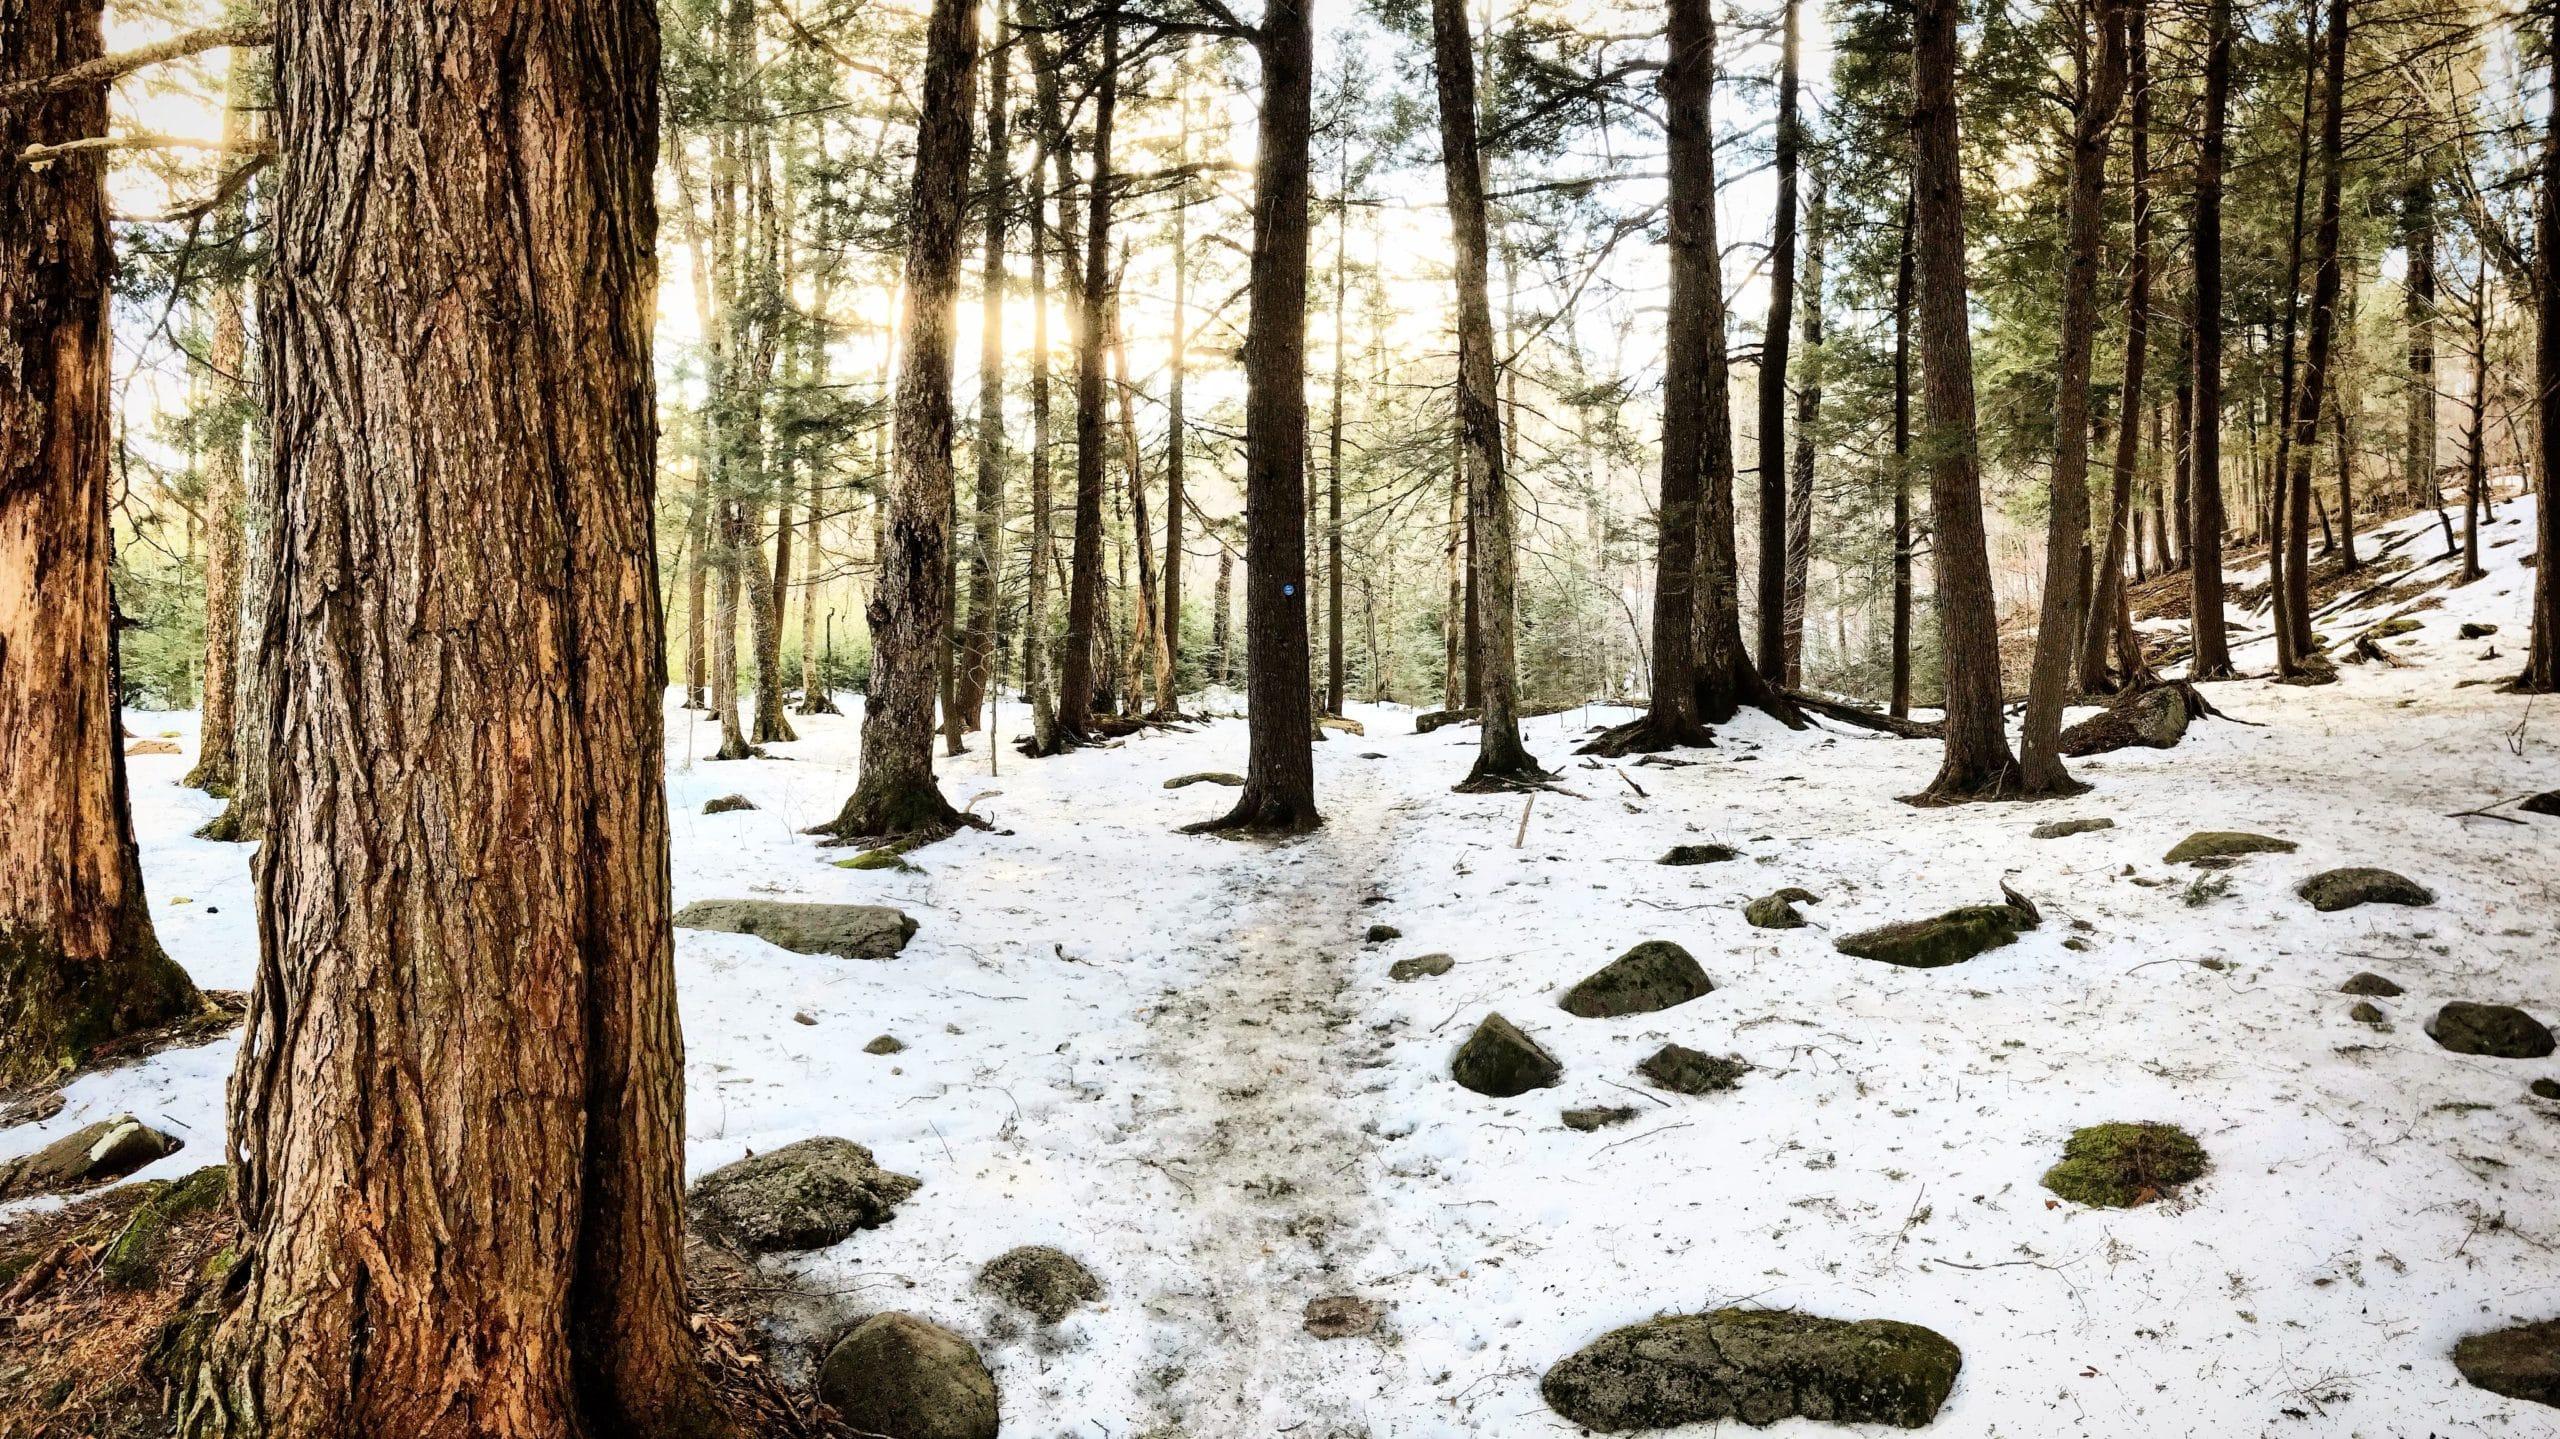 Denning Woods